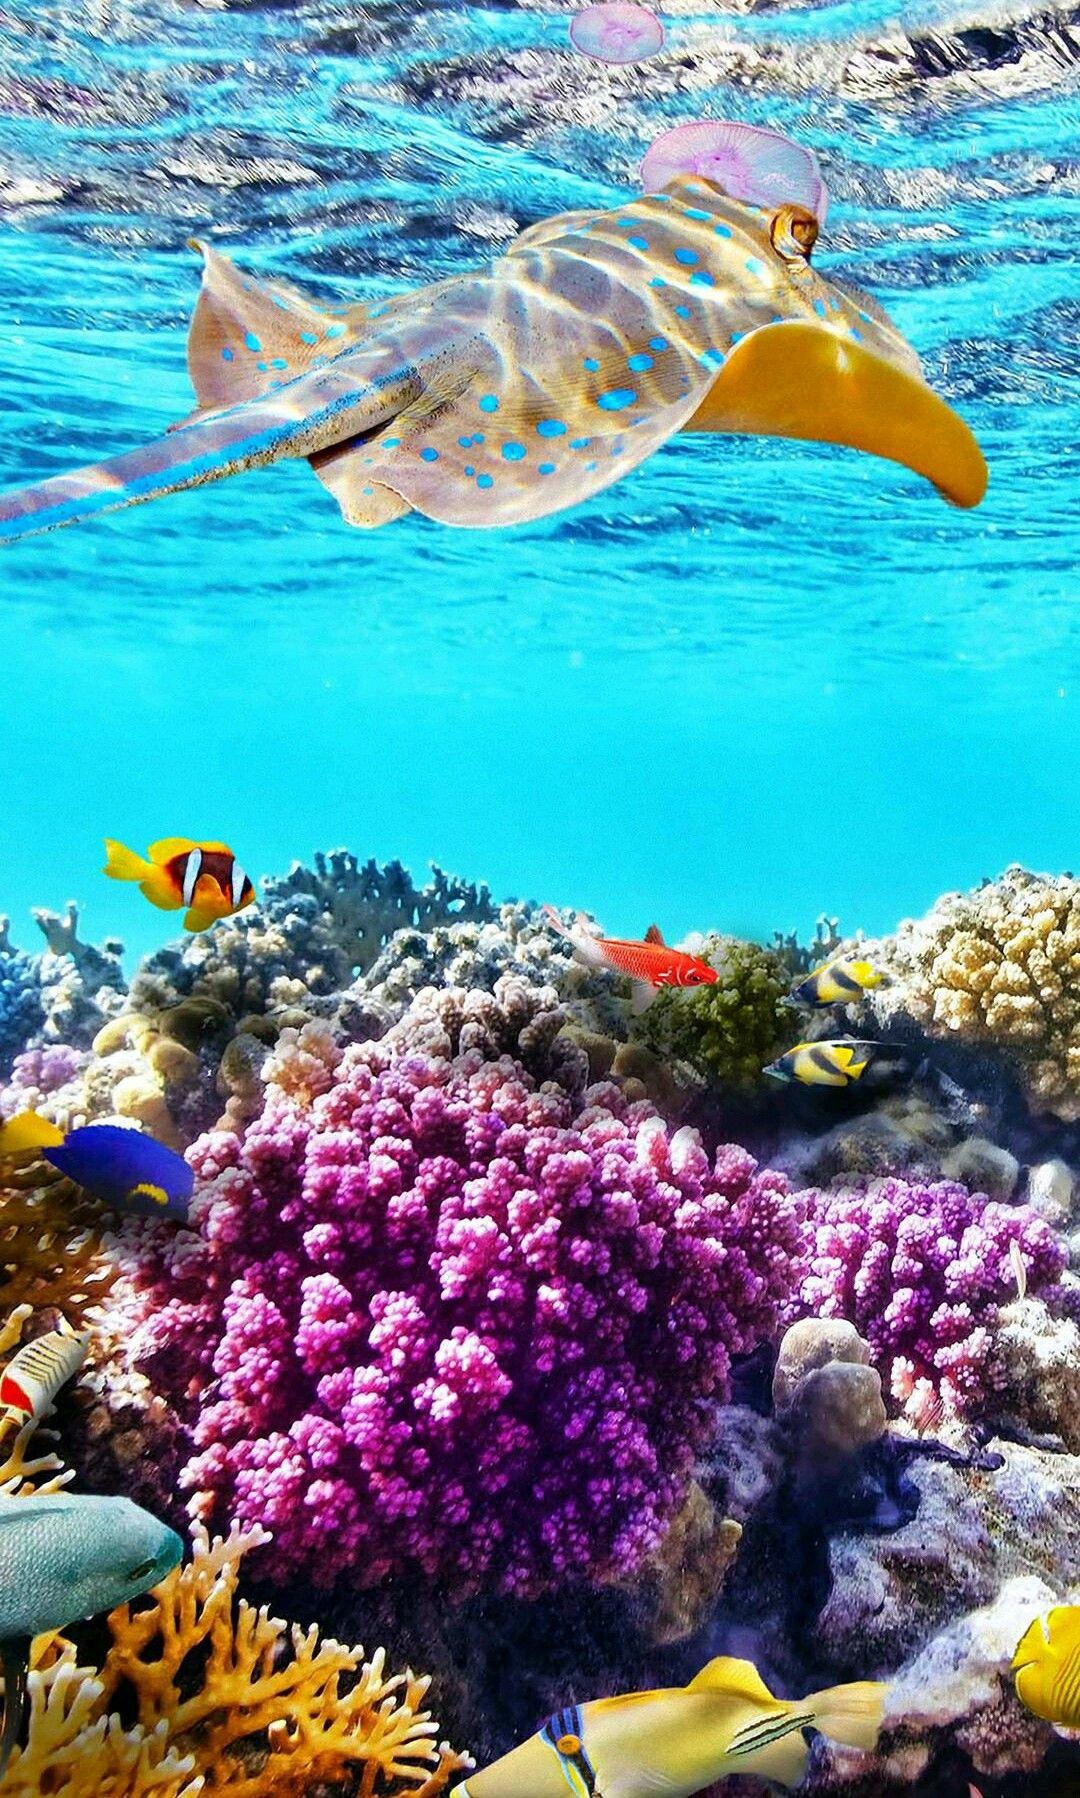 Pin by Ariel Dobrowolski on The ocean Underwater